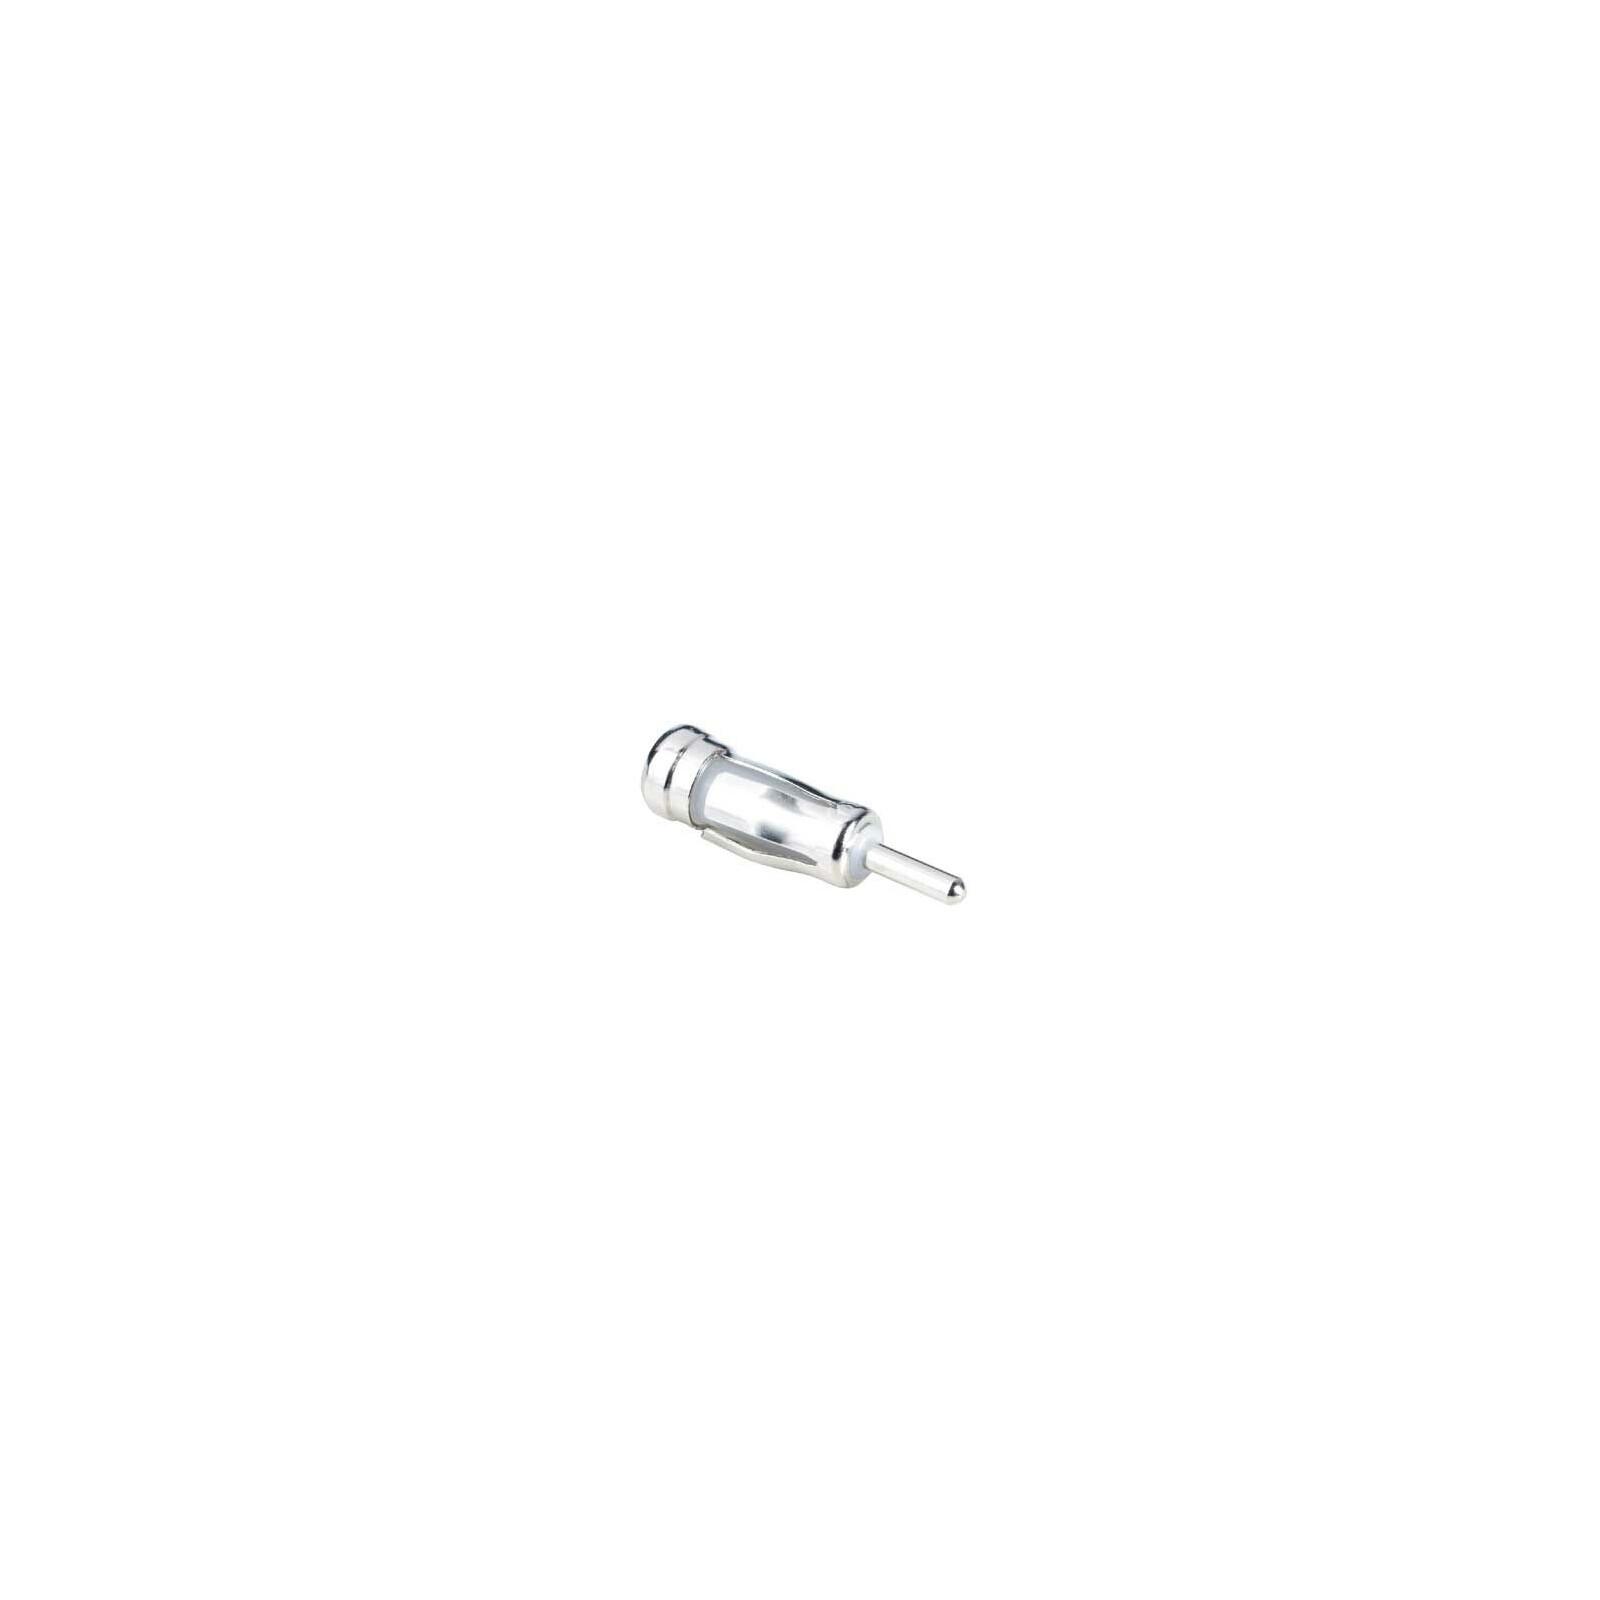 Hama 43642 Antennen-Adapter Stecker DIN - Kupplung ISO